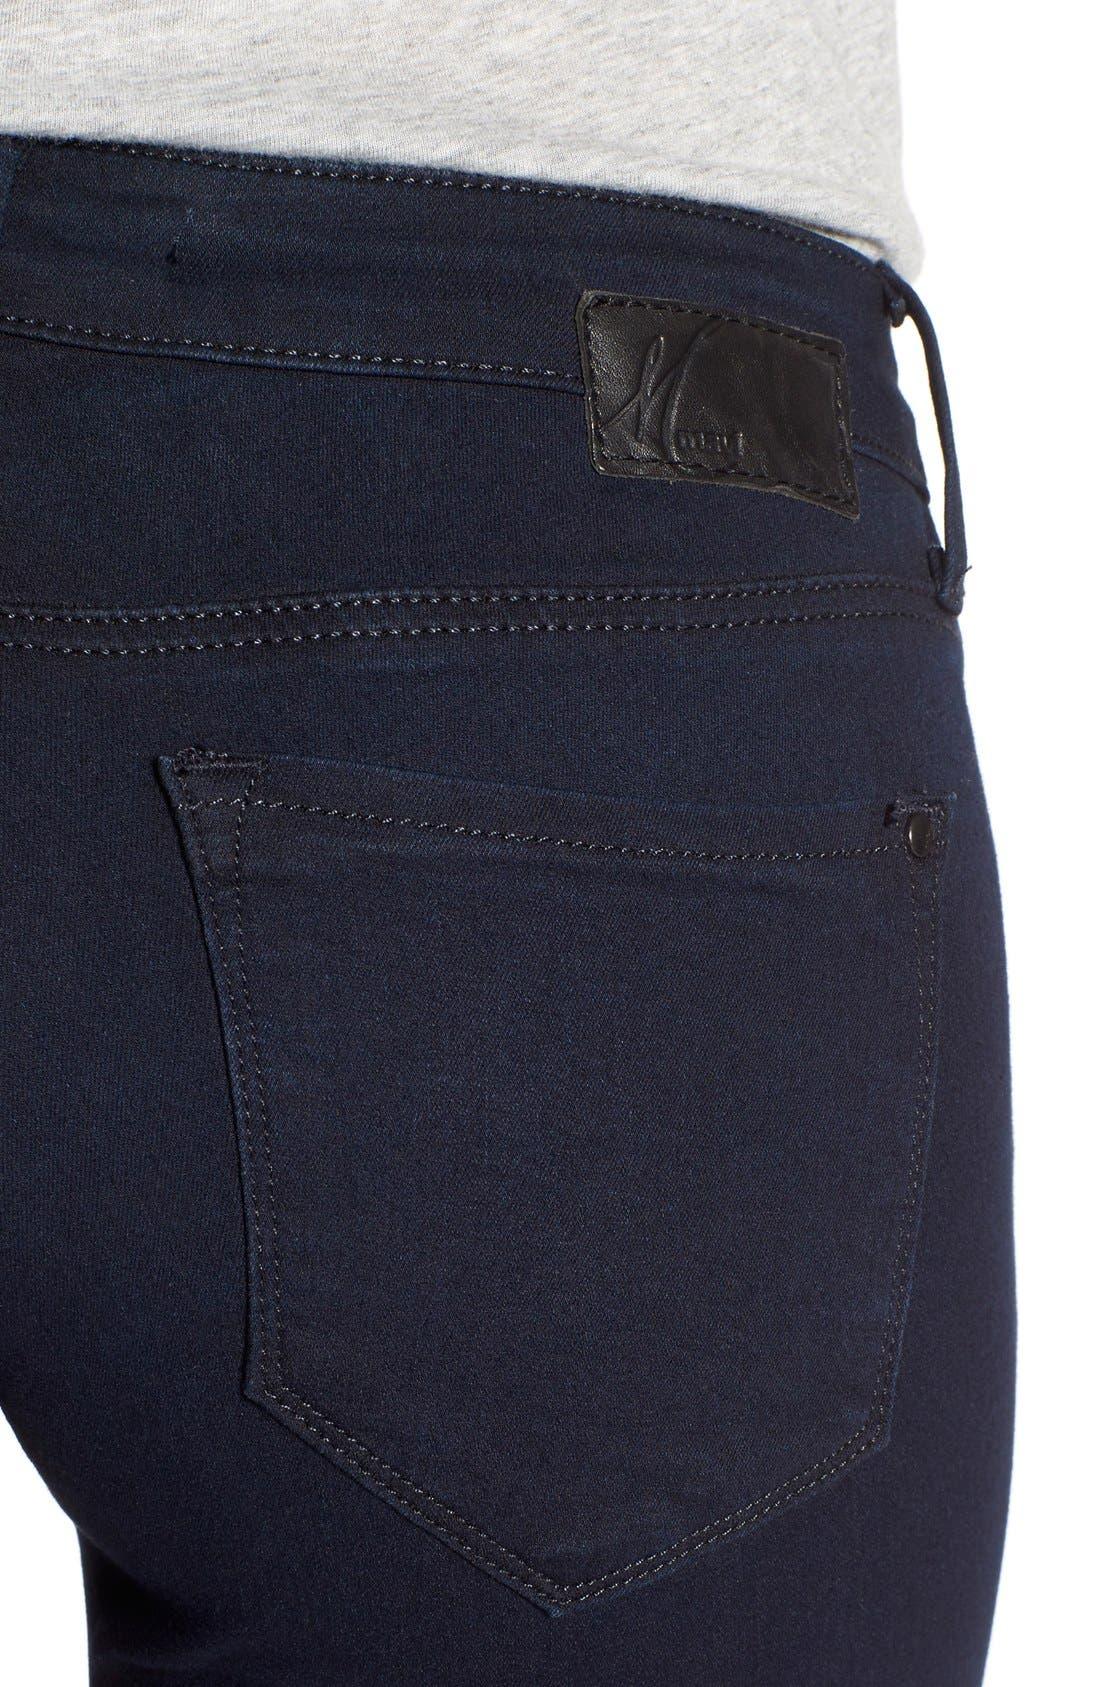 'Serena' Stretch Skinny Jeans,                             Alternate thumbnail 3, color,                             401